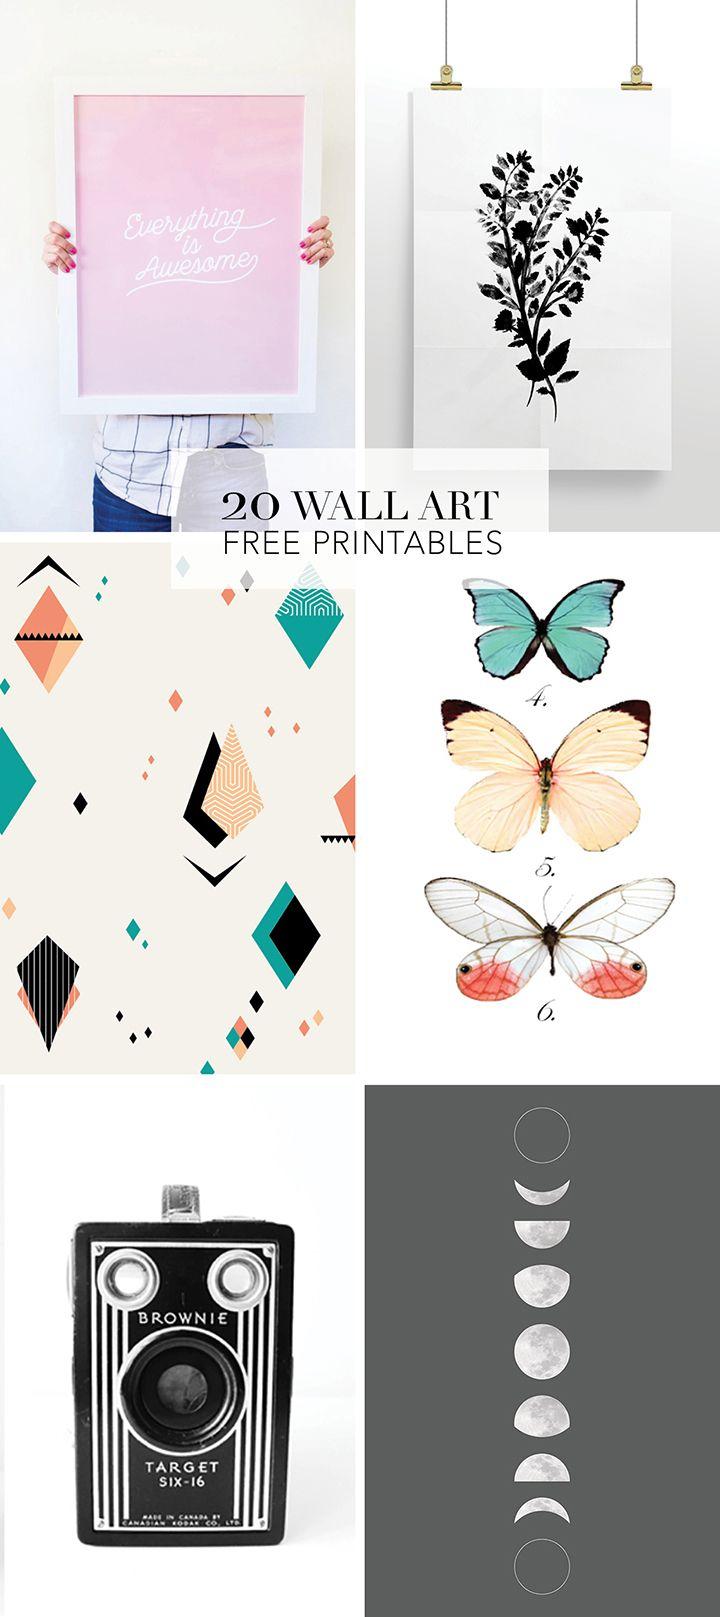 20 Favorite Wall Art Free Printables | Frases Lindas! | Ideias De - Free Printable Wall Posters